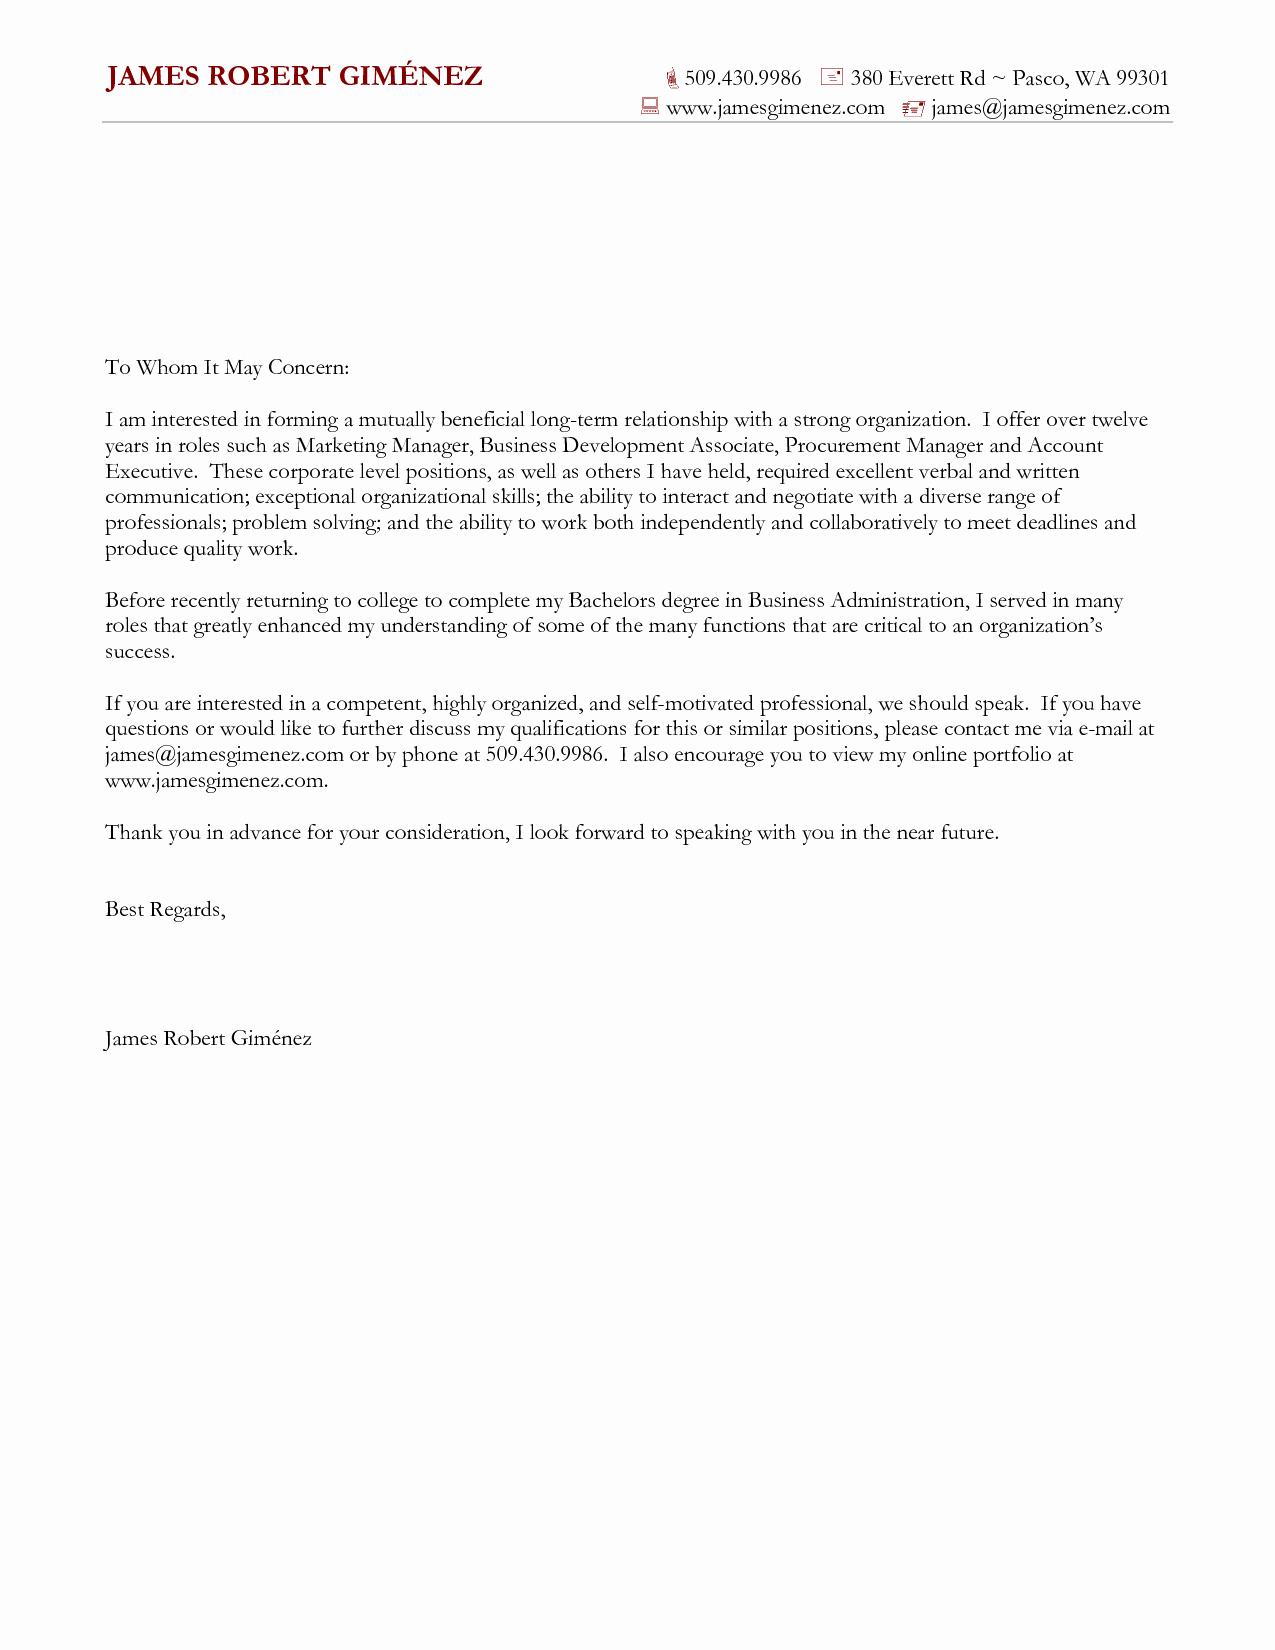 General Cover Letter format Fresh Cover Letter for General Application Cover Letter